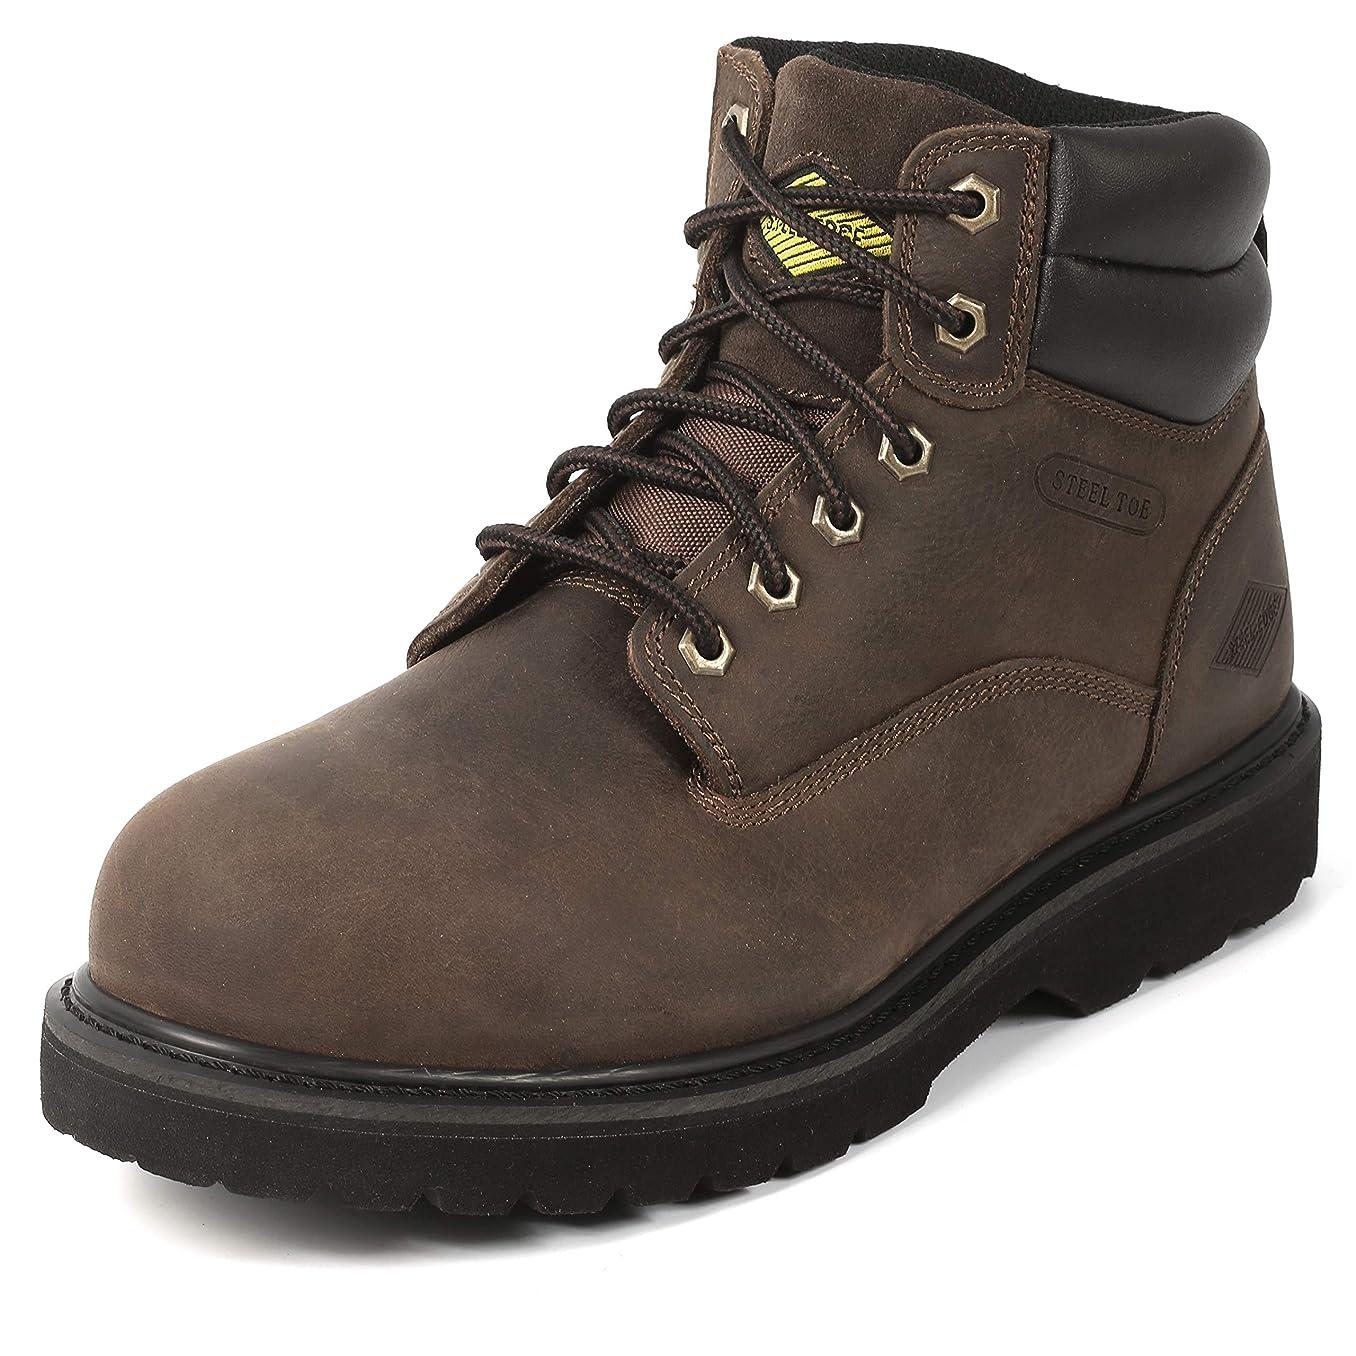 Steel Toe Work Boots for Men 6